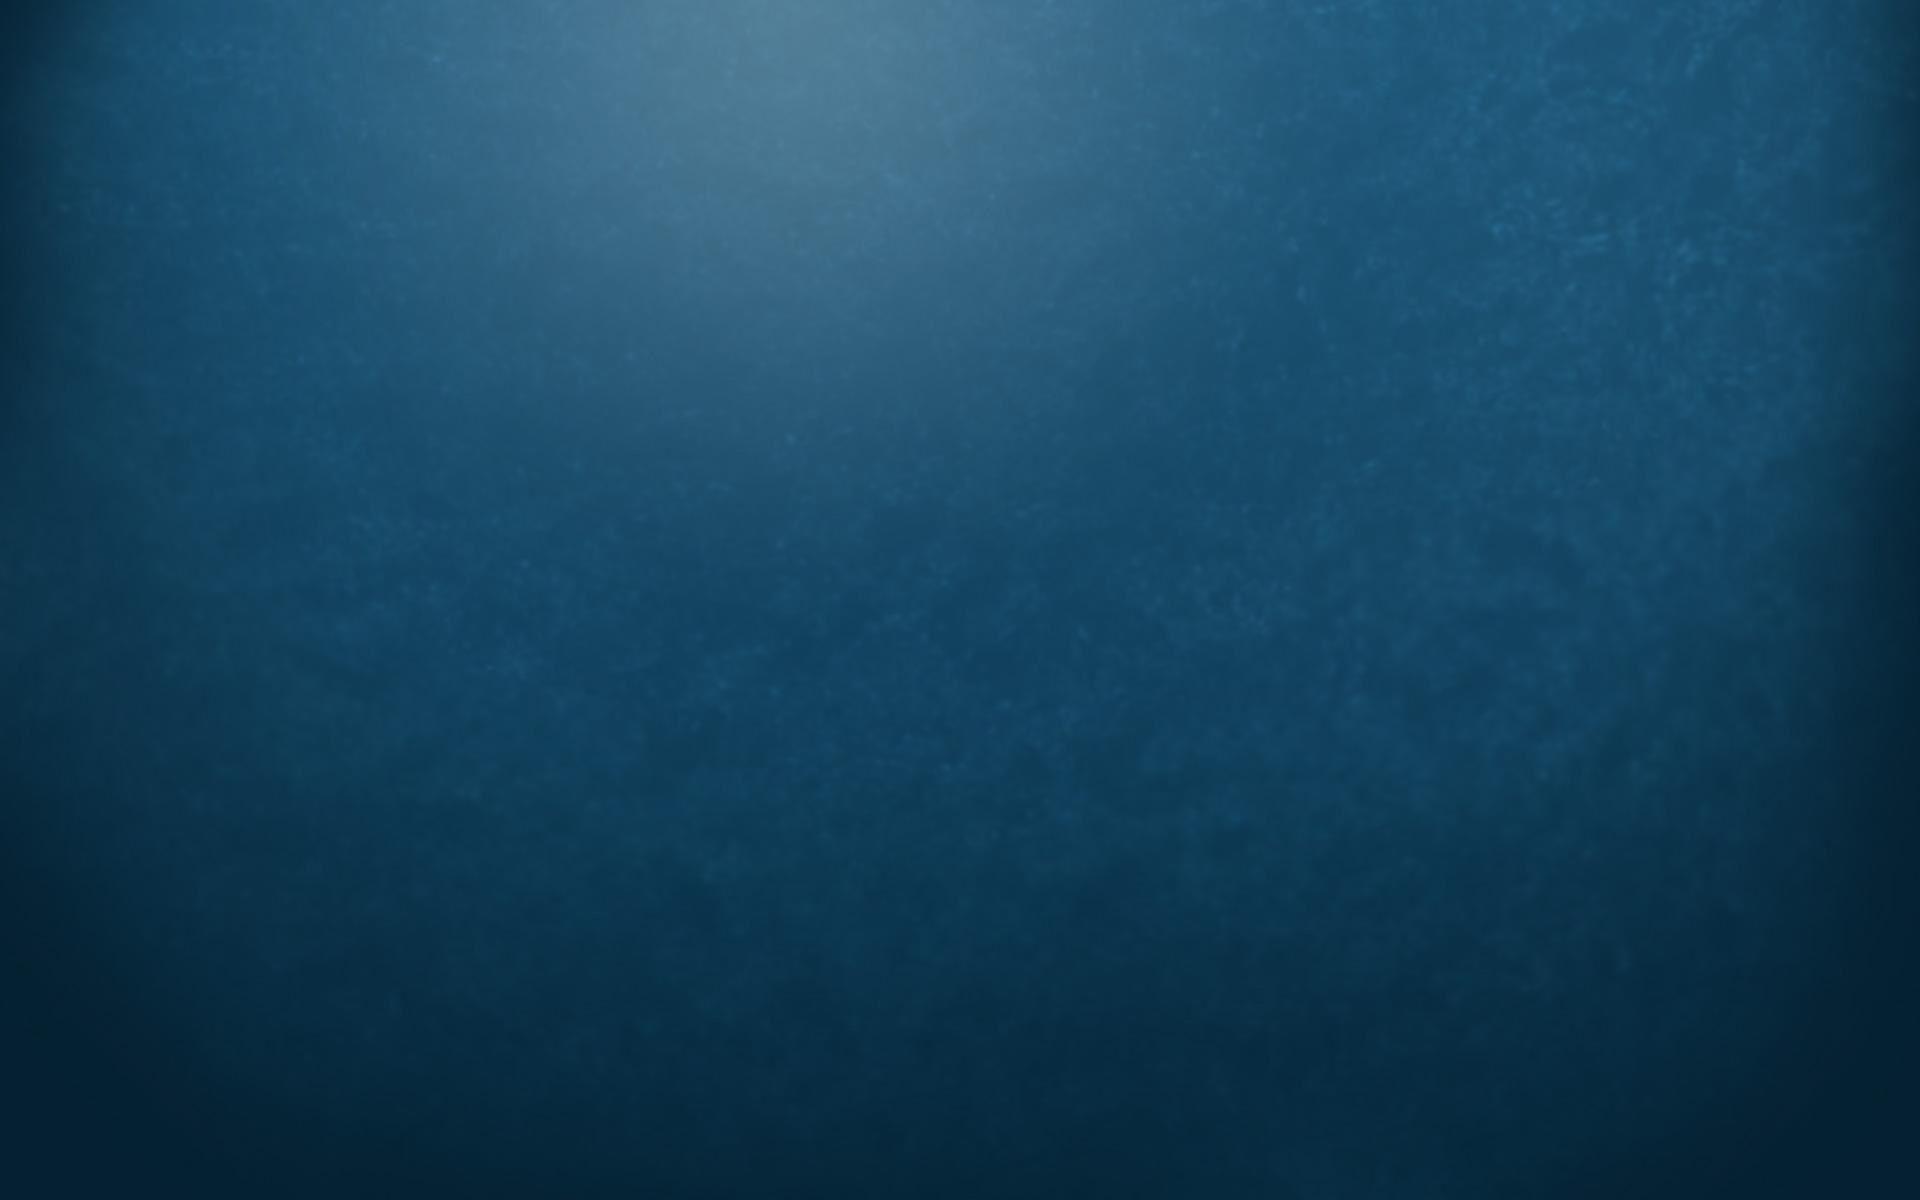 free download plain wallpaper hd ololoshenka pinterest plain